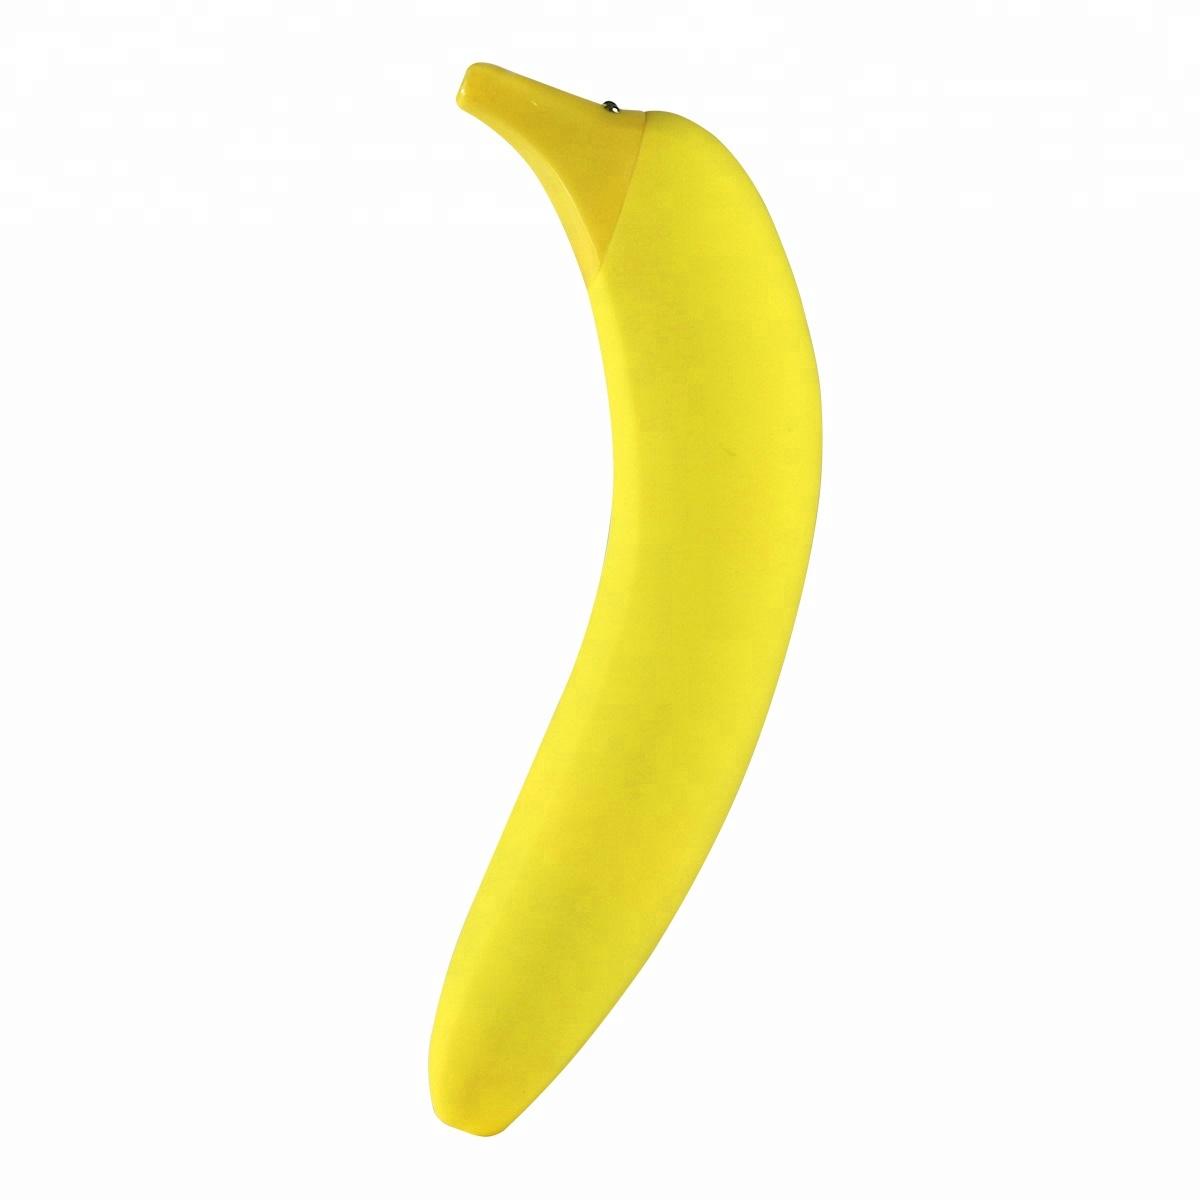 Трахнул бананом вас